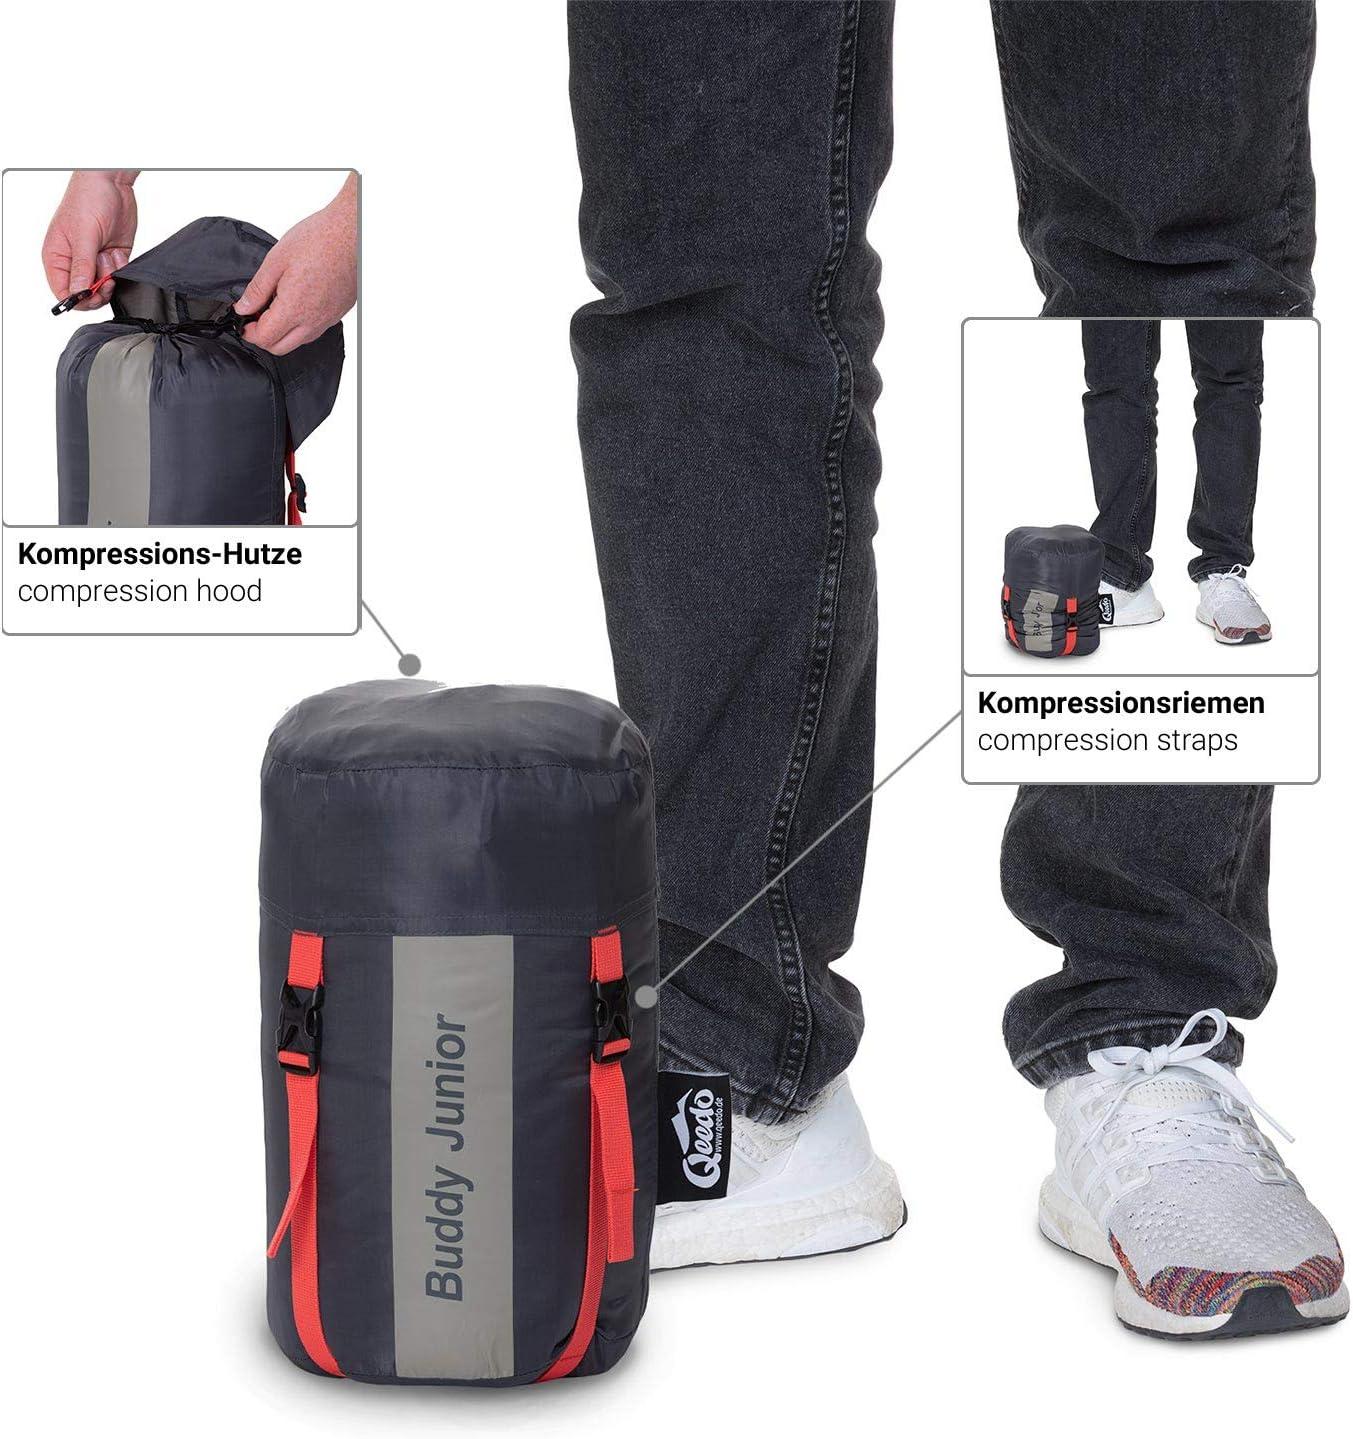 Best Shape /& Soft Touch Comfort Control Qeedo Buddy Junior Saco de Dormir ni/ños